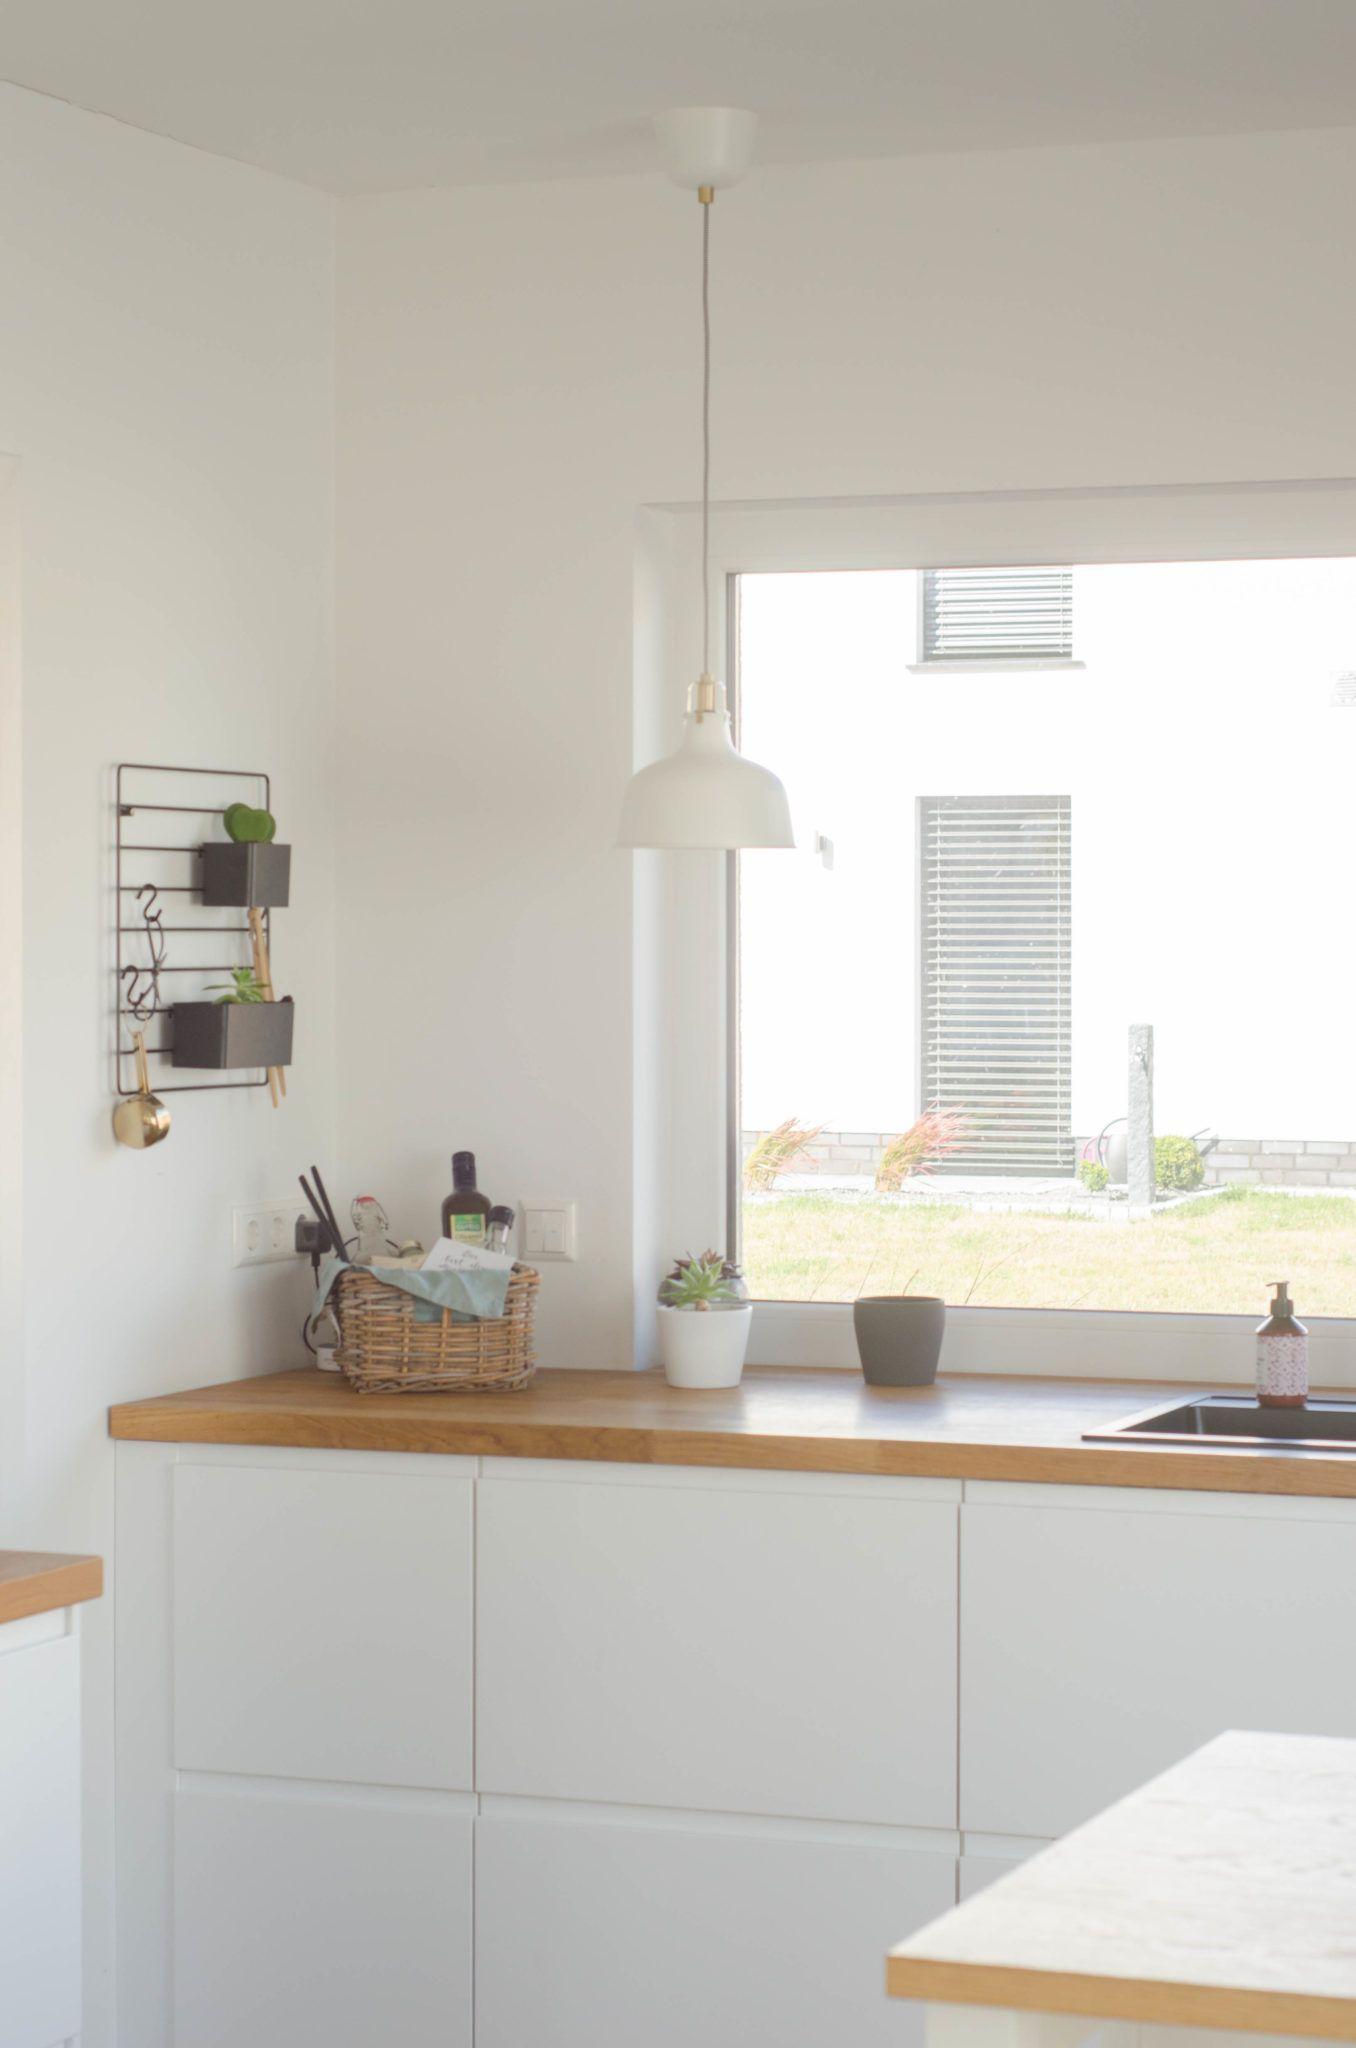 A Comprehensive Overview On Home Decoration In 2020 Ikea Kitchen Popular Kitchen Designs Diy Furniture Nightstand